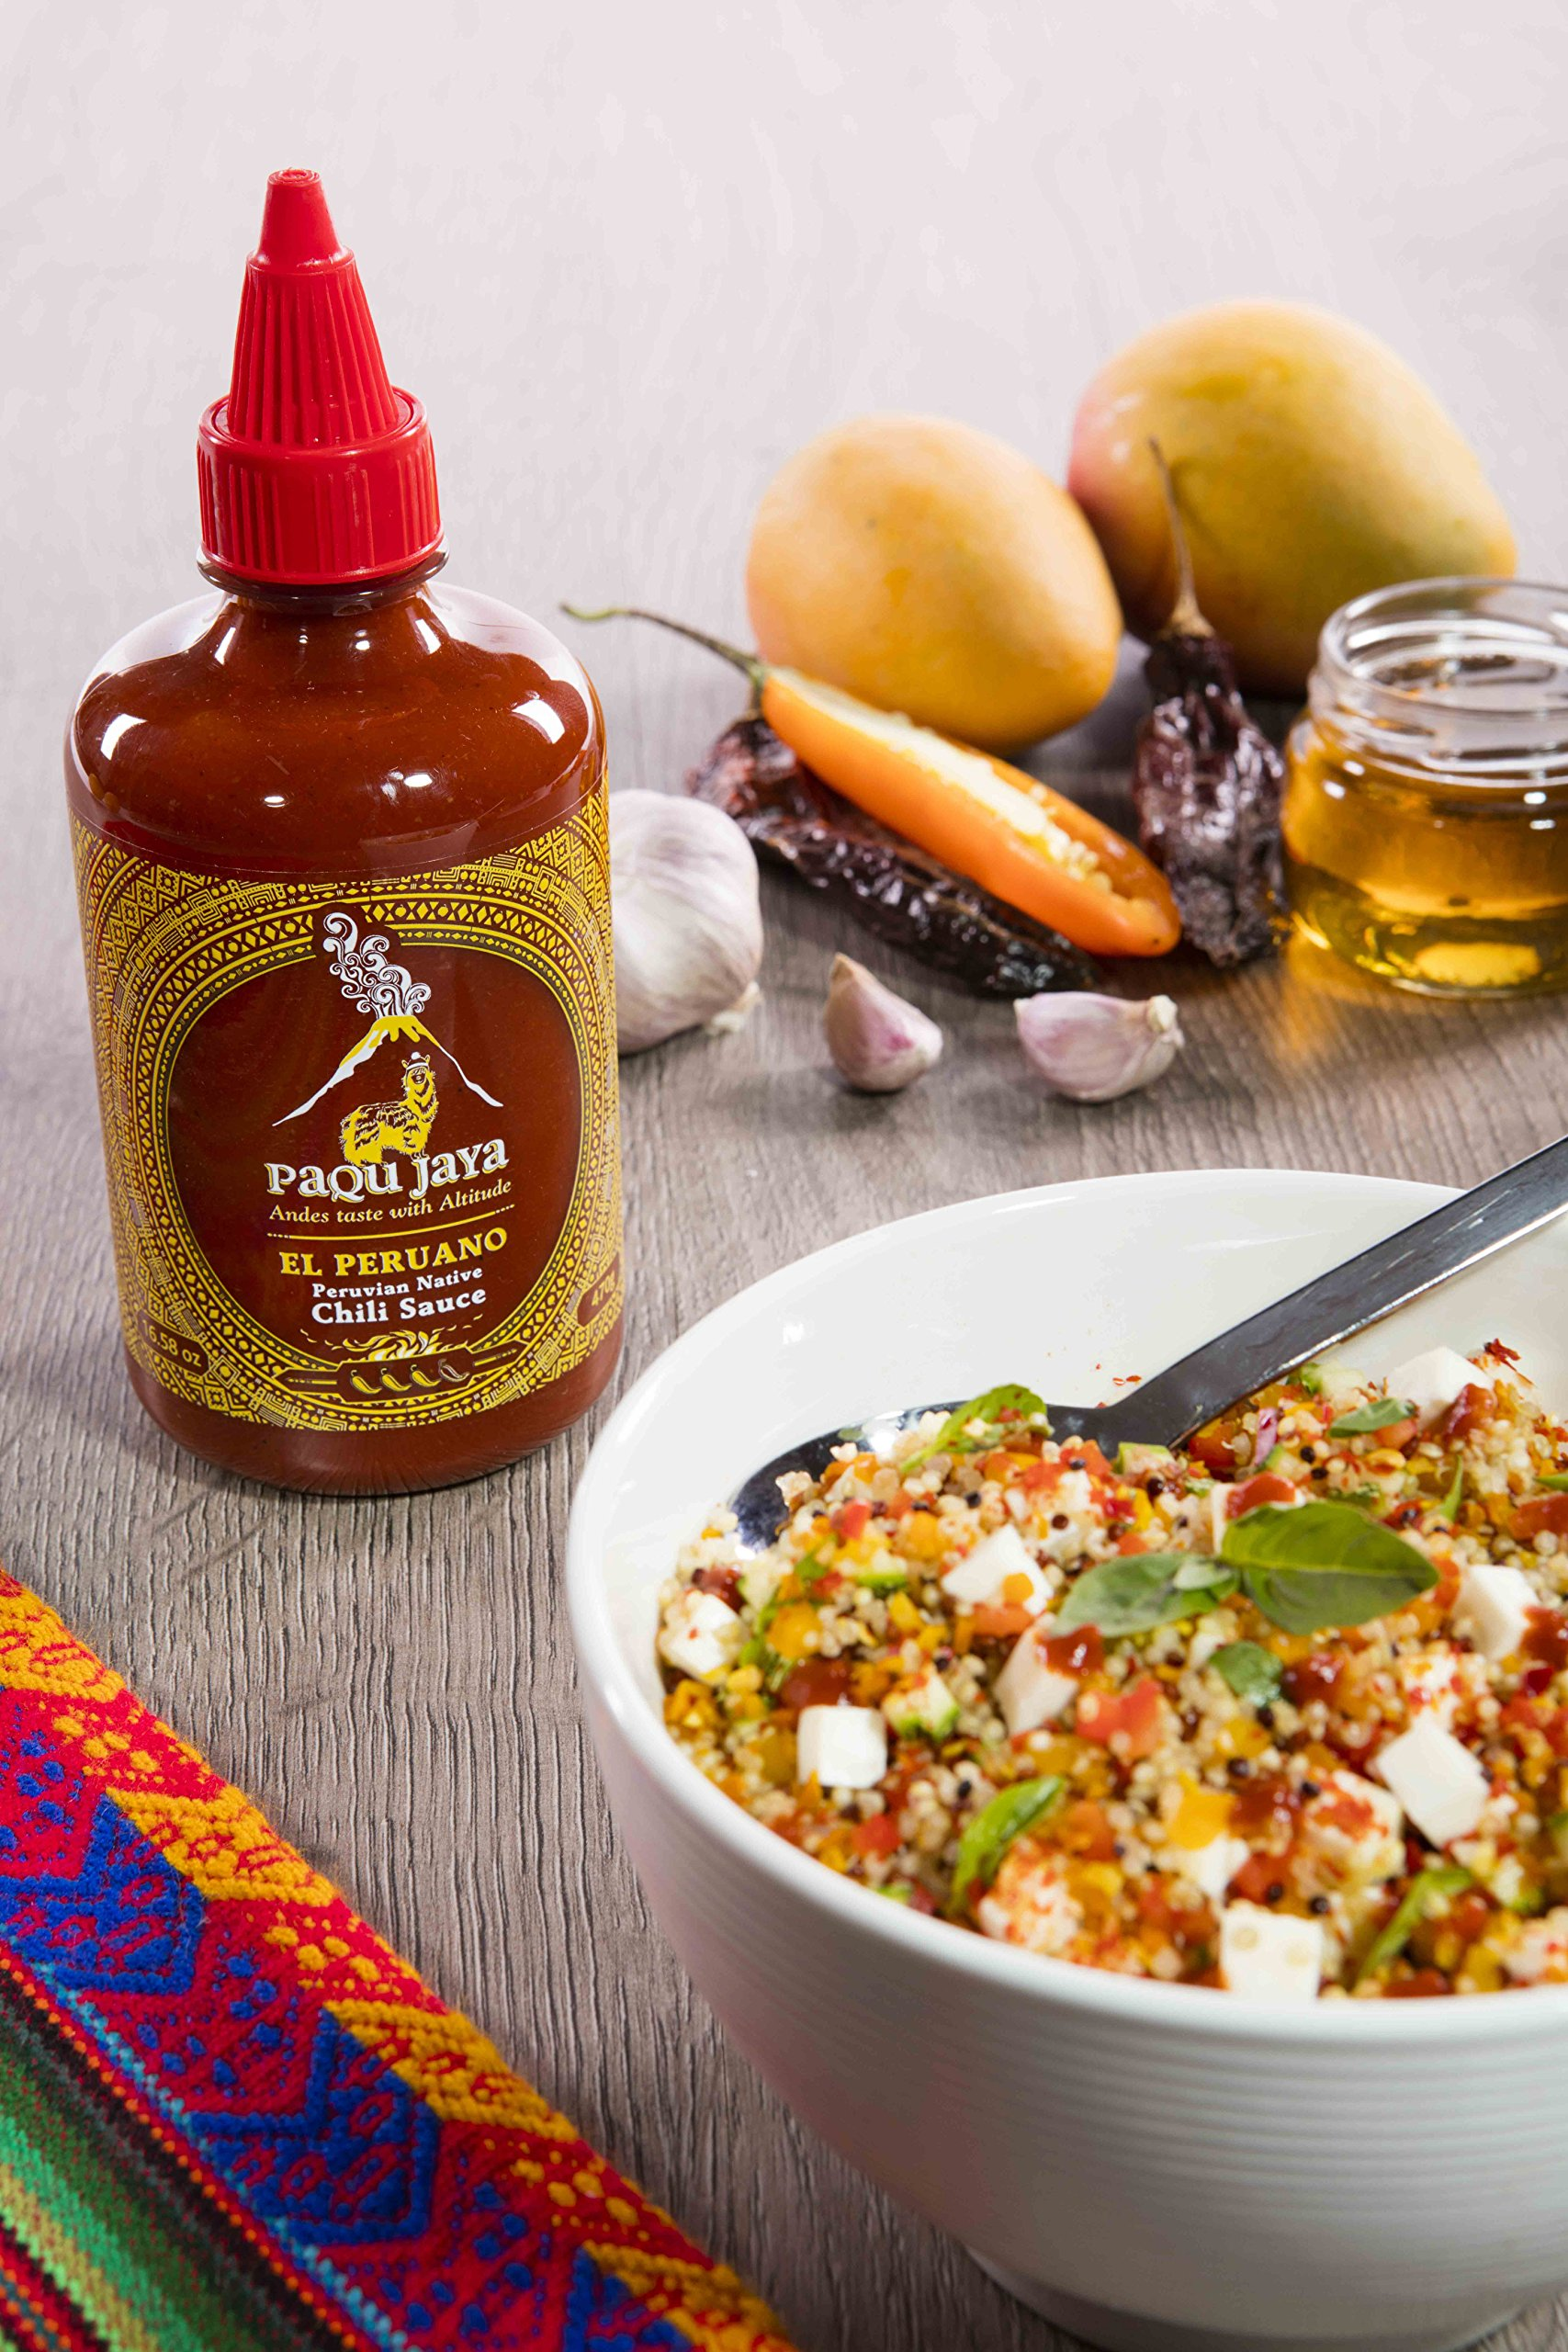 Paqu Jaya - El Peruano Native Chili Hot Sauce by Paqu Jaya (Image #3)